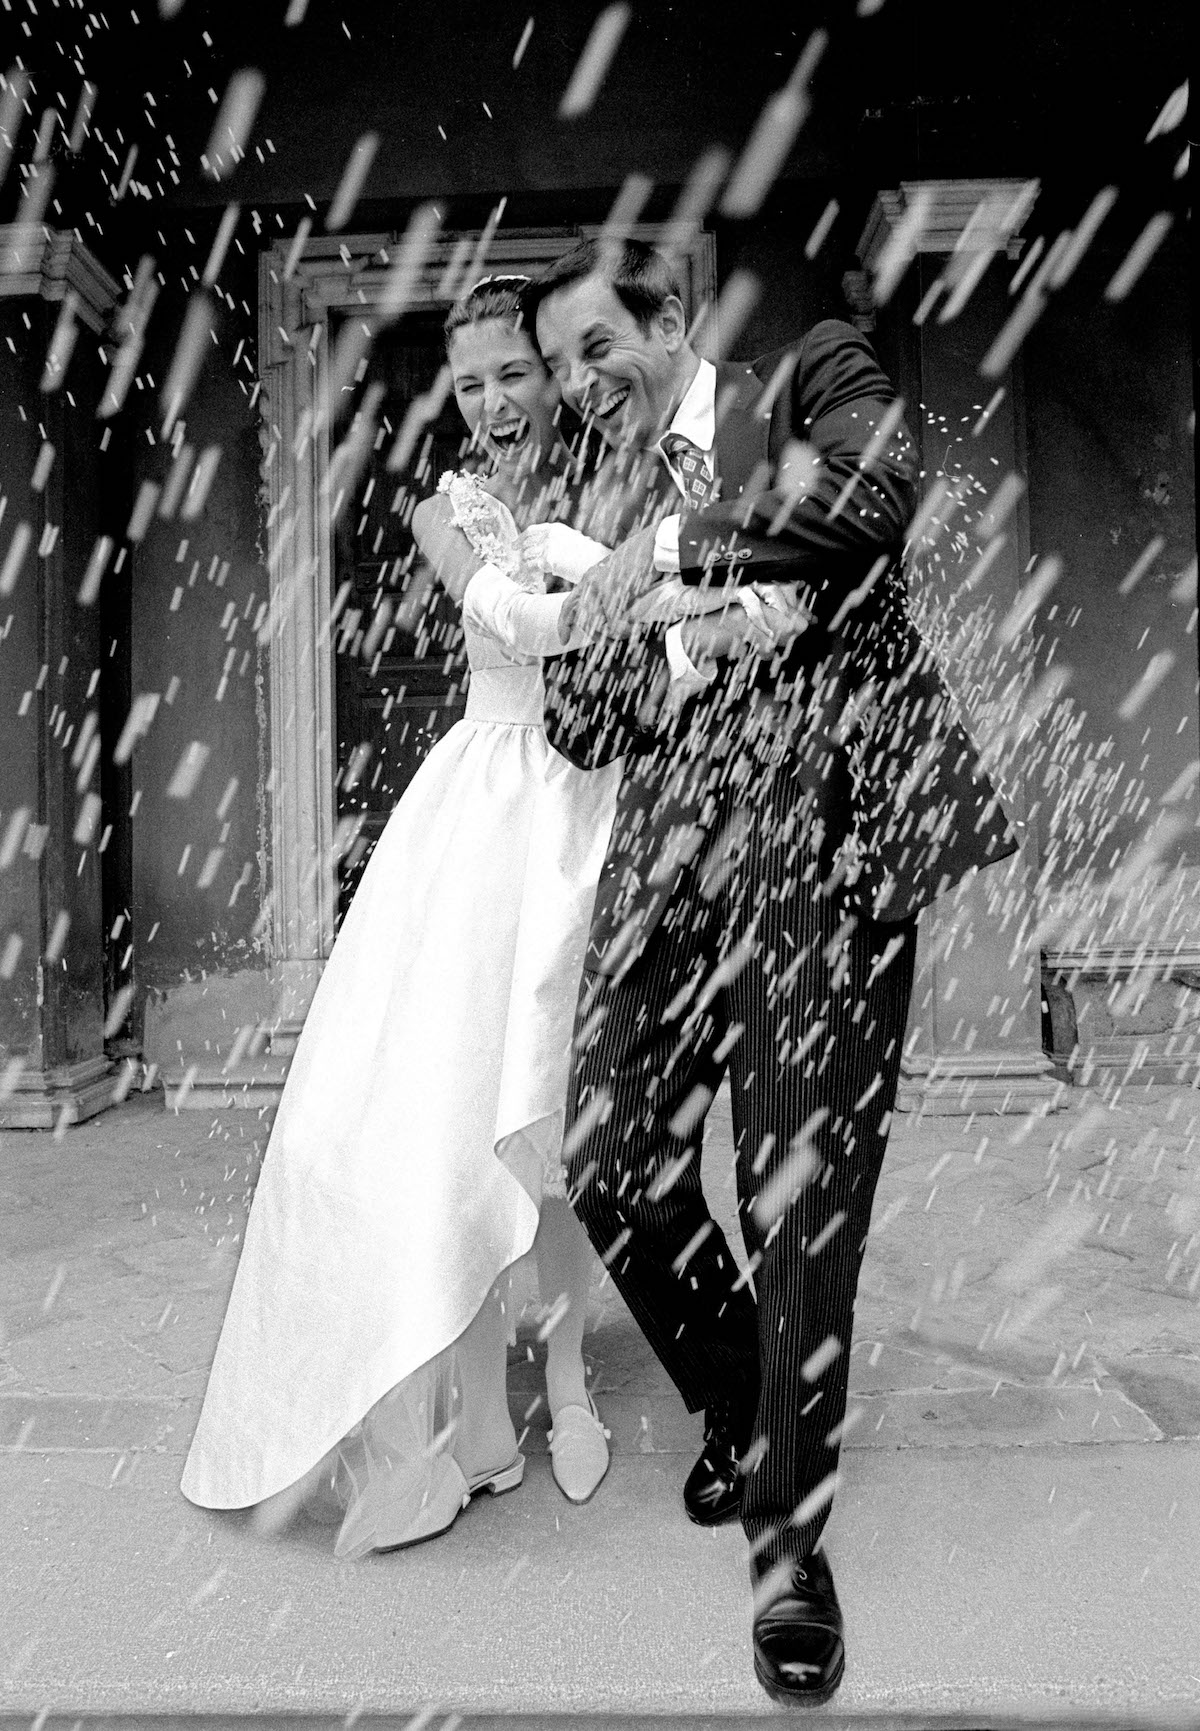 Joy Photographs of Life's Happiest Moments Joy libro fotos inspiradoras Robert Emmons Bruce Vellick